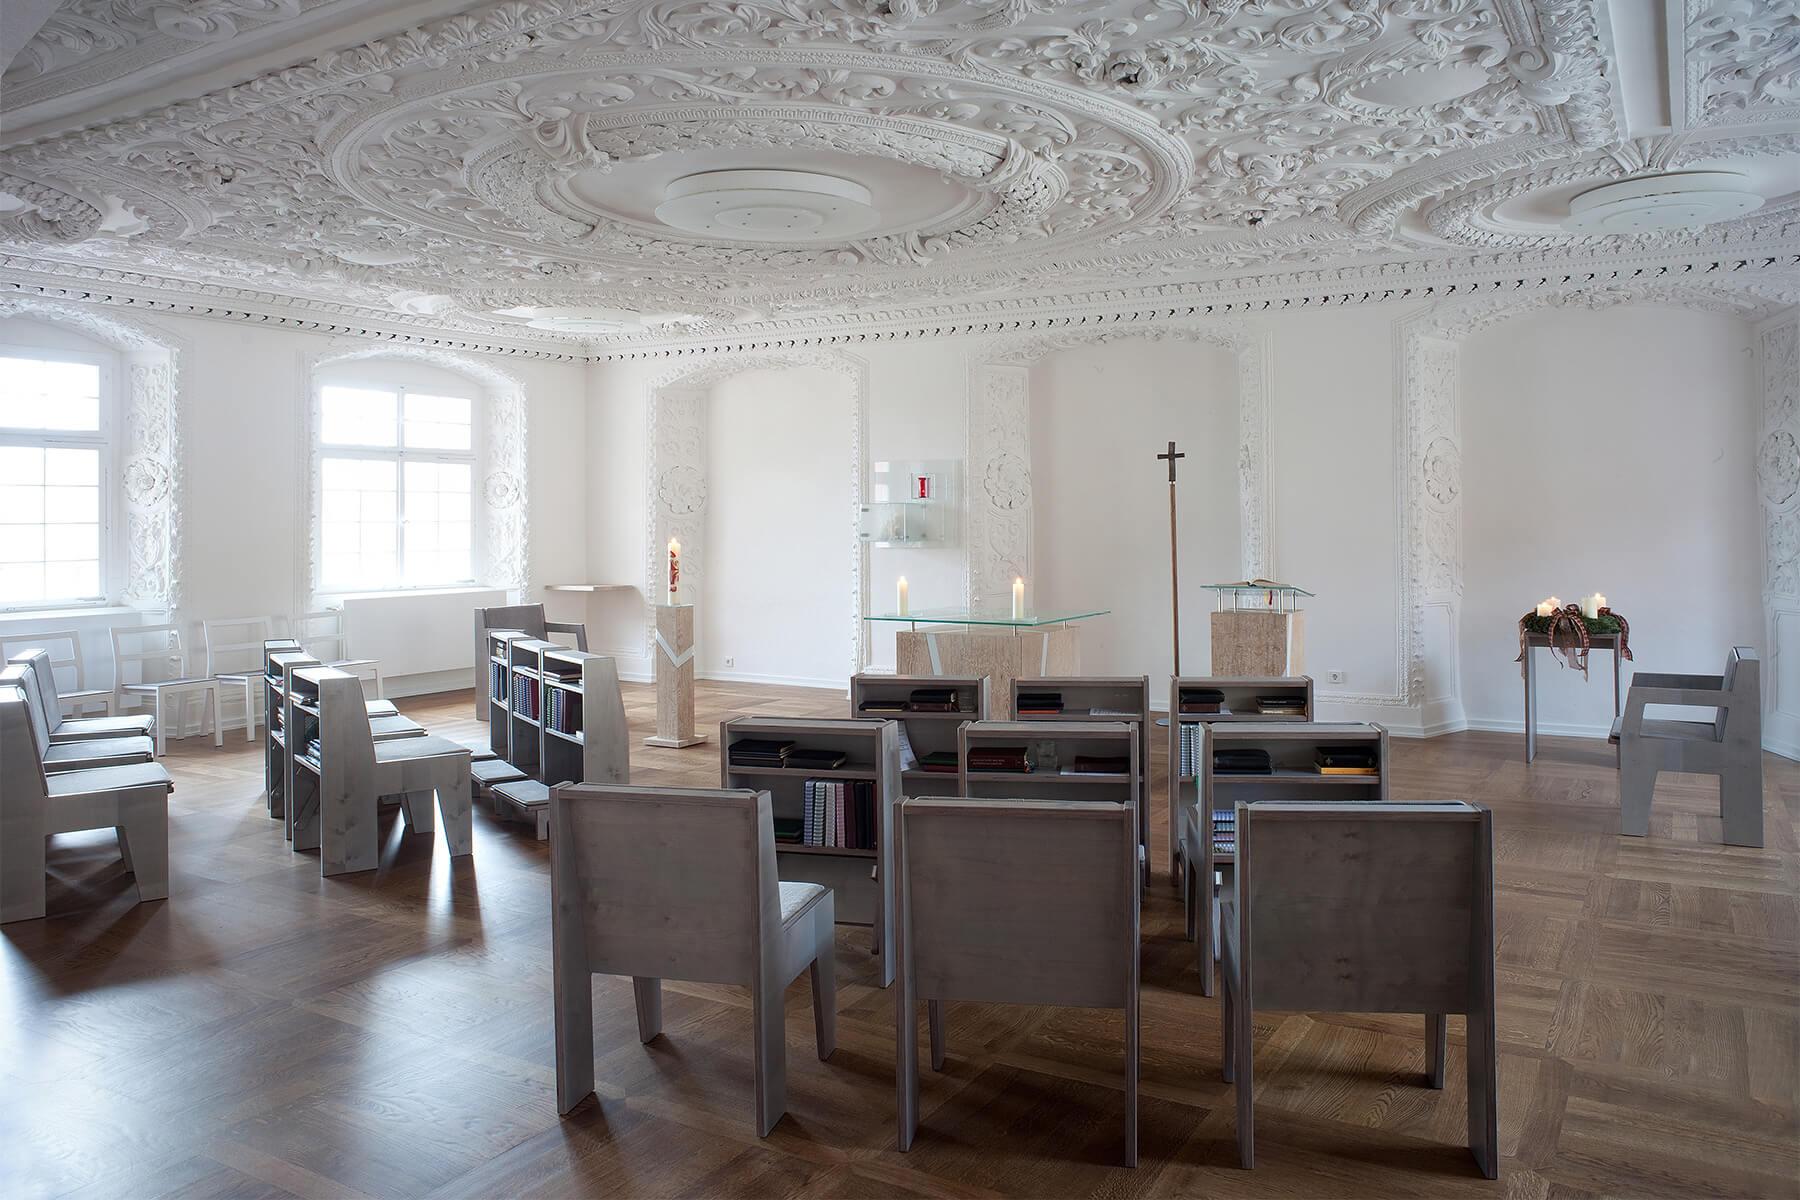 Barbara Jäger OMI Riesterer Werke in Kirchen Kloster Wald